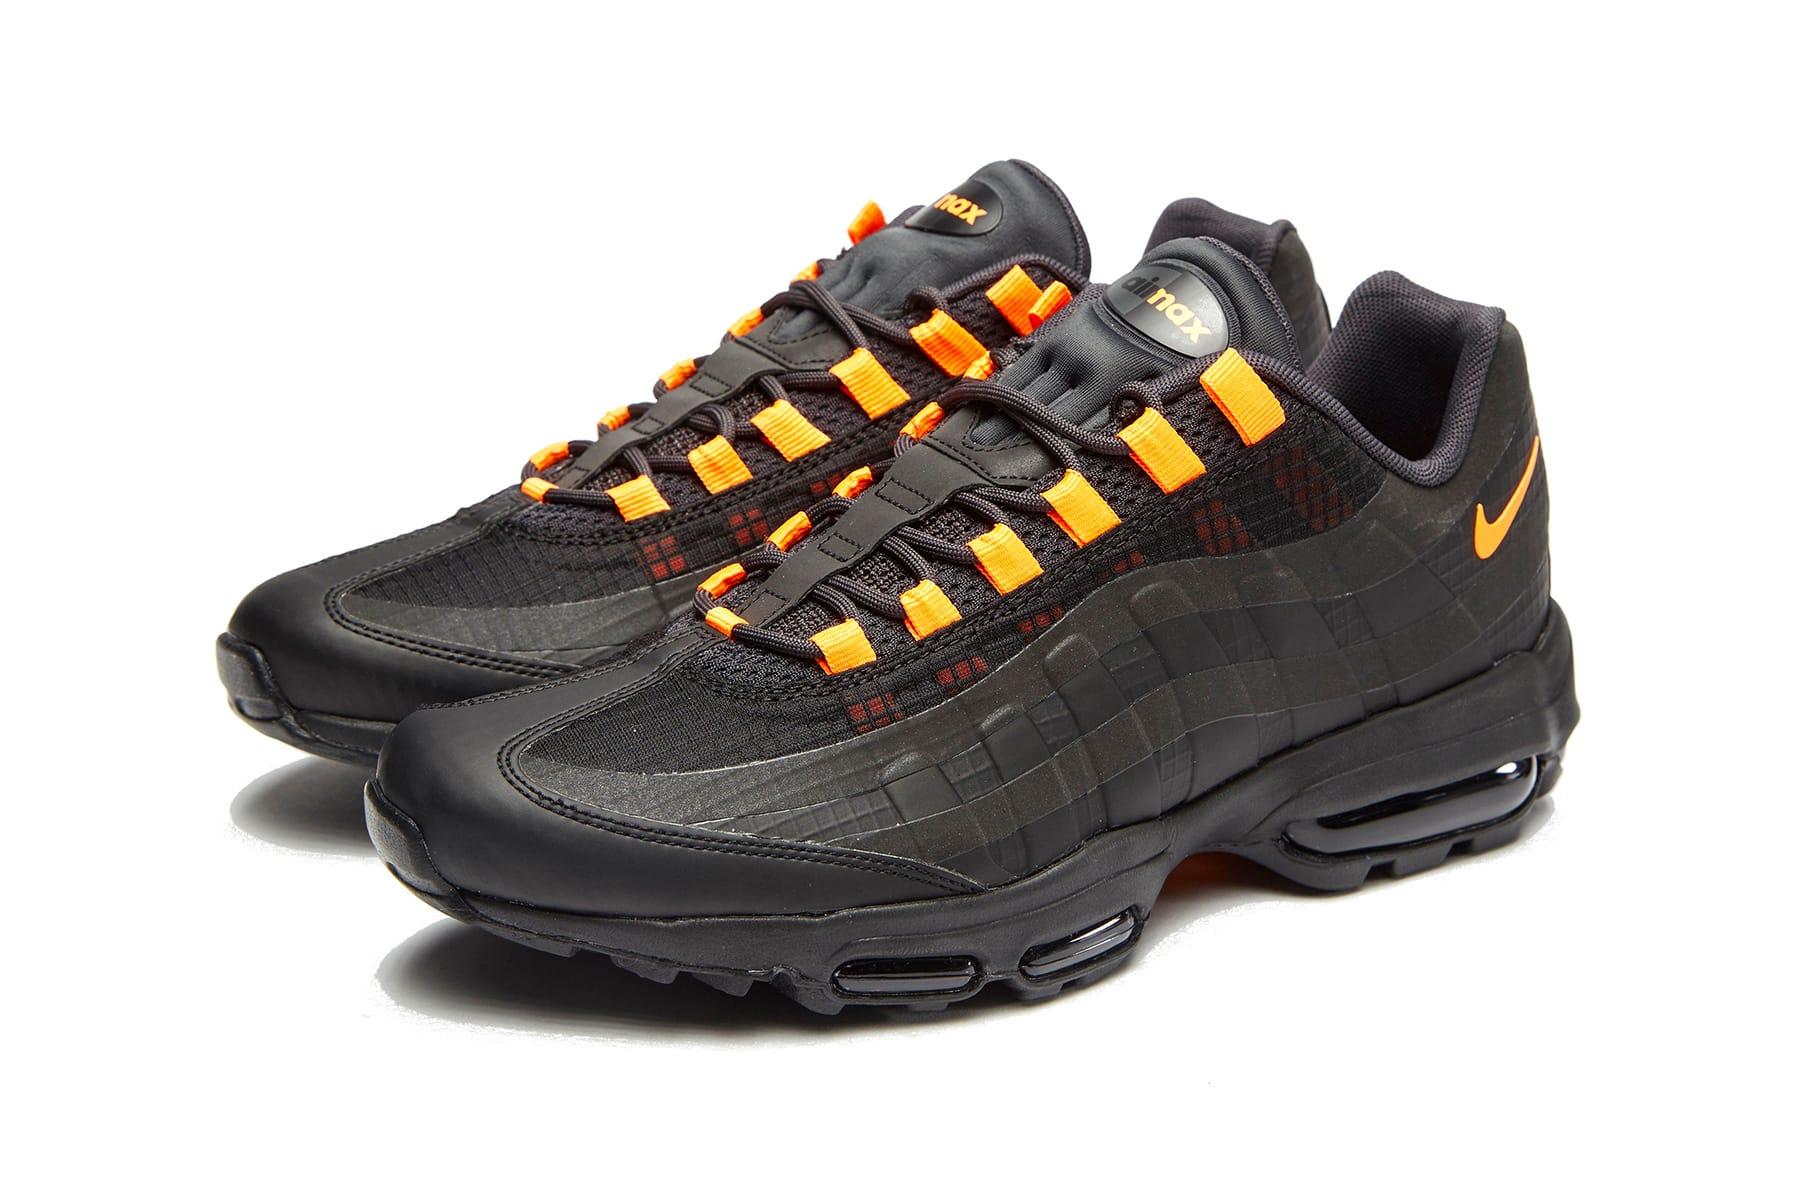 nike air max 95 ultra se black and orange